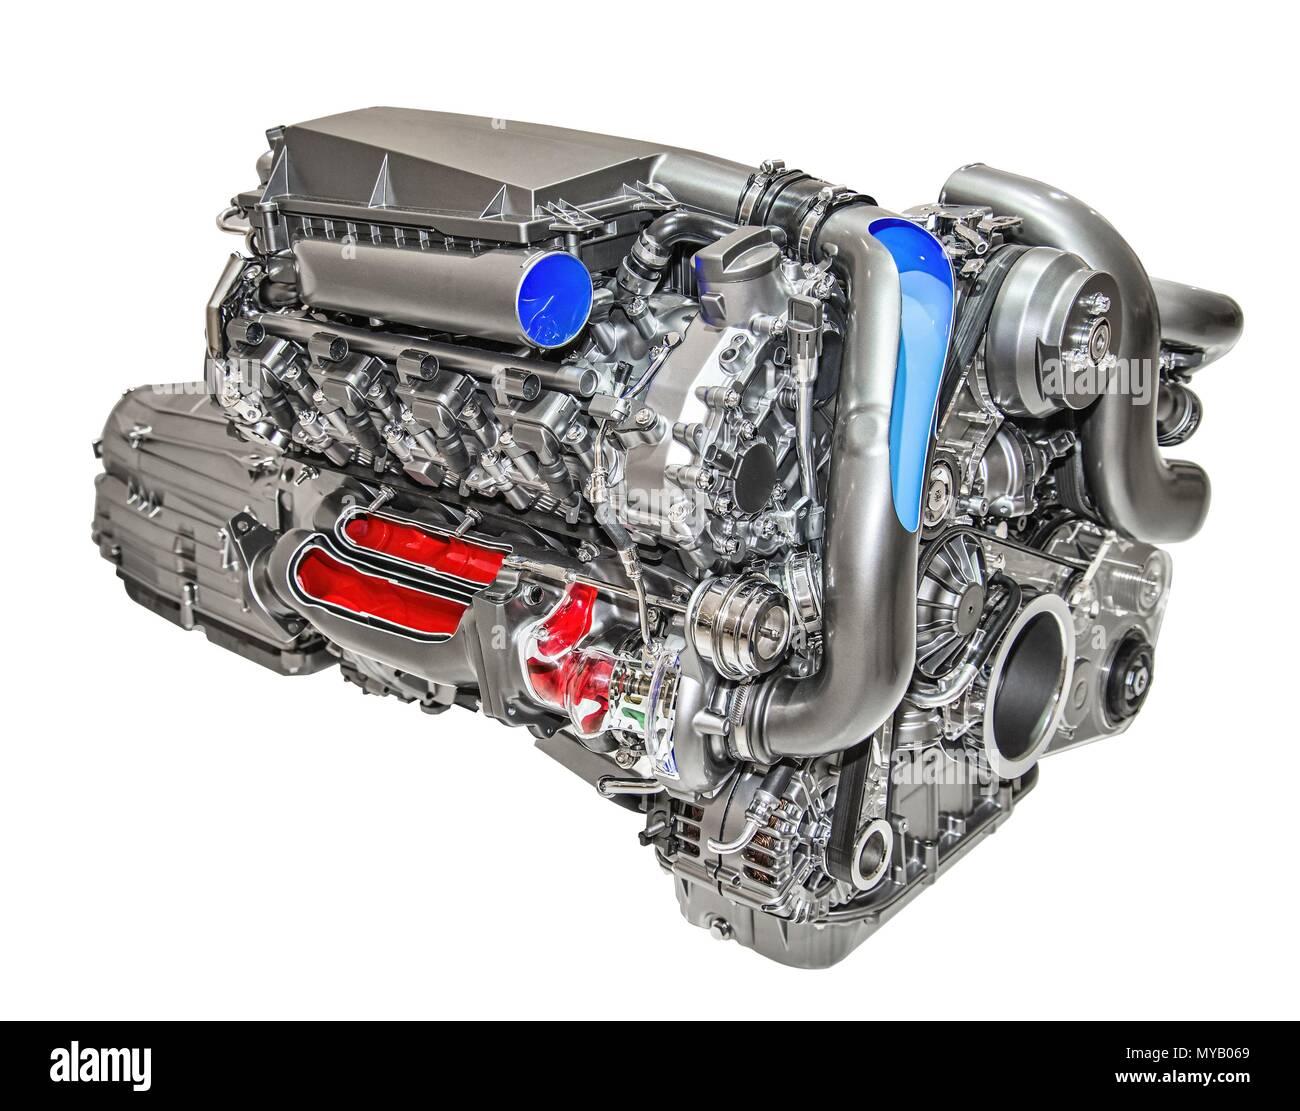 Modern 8-cylinder engine of a luxury car | usage worldwide - Stock Image